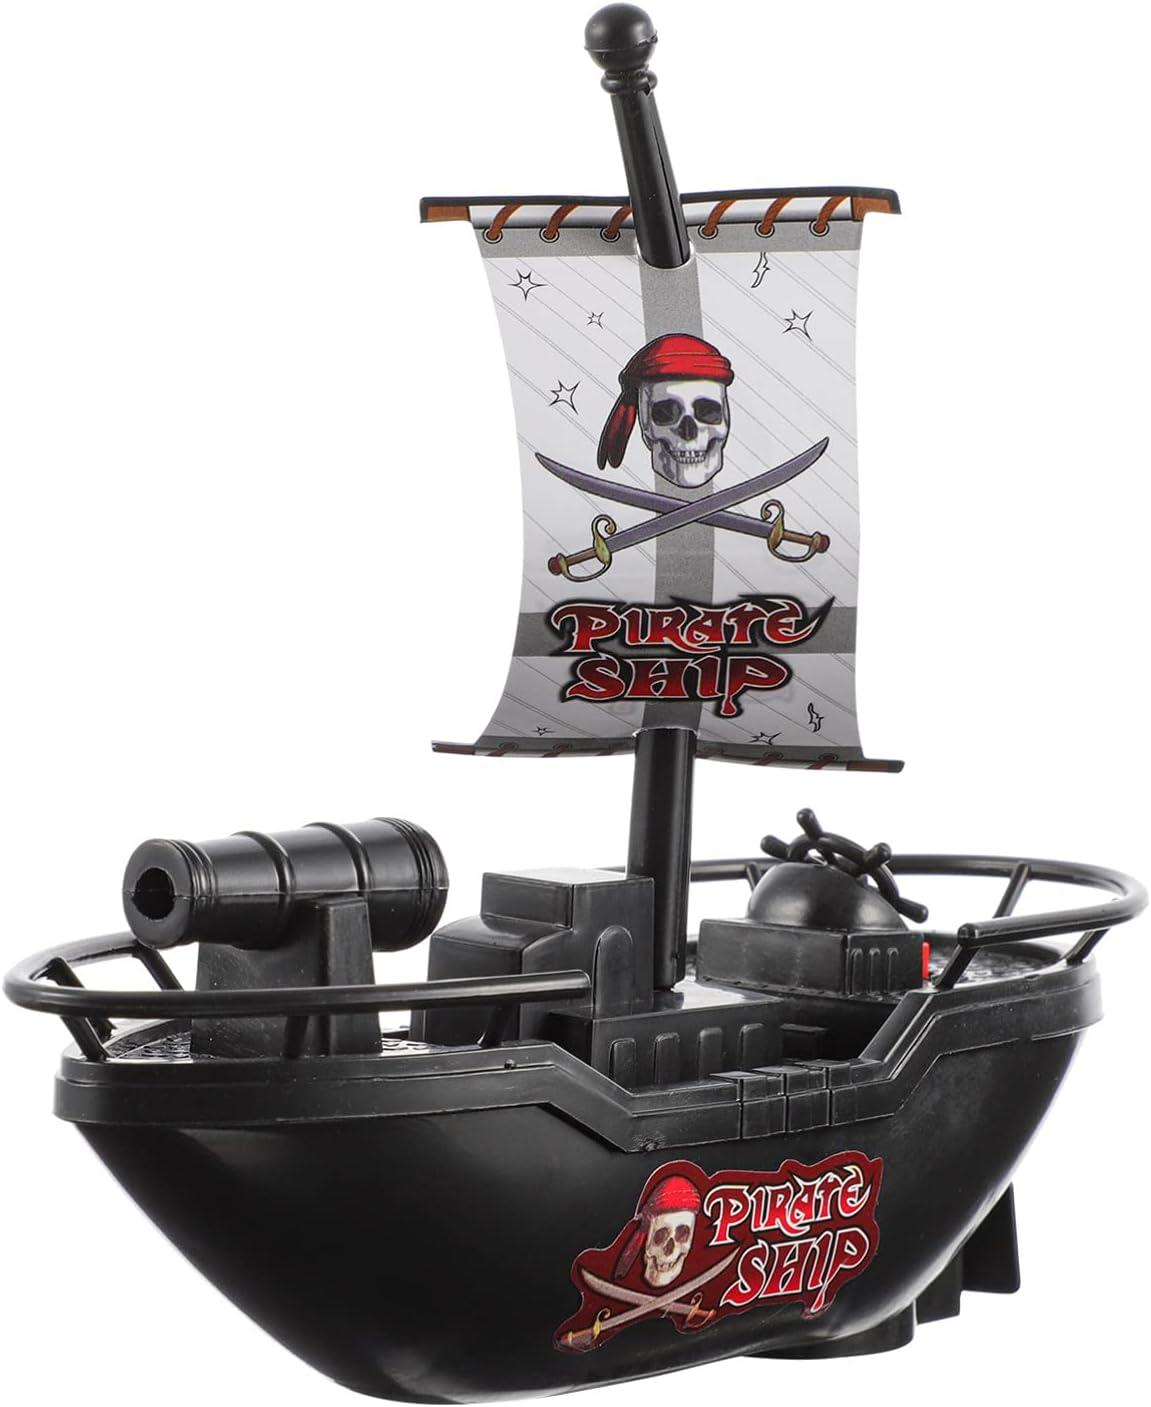 TOYANDONA 1pc Electric Pool Pirate Toy Model Bombing new work Elegant T Warship Boat